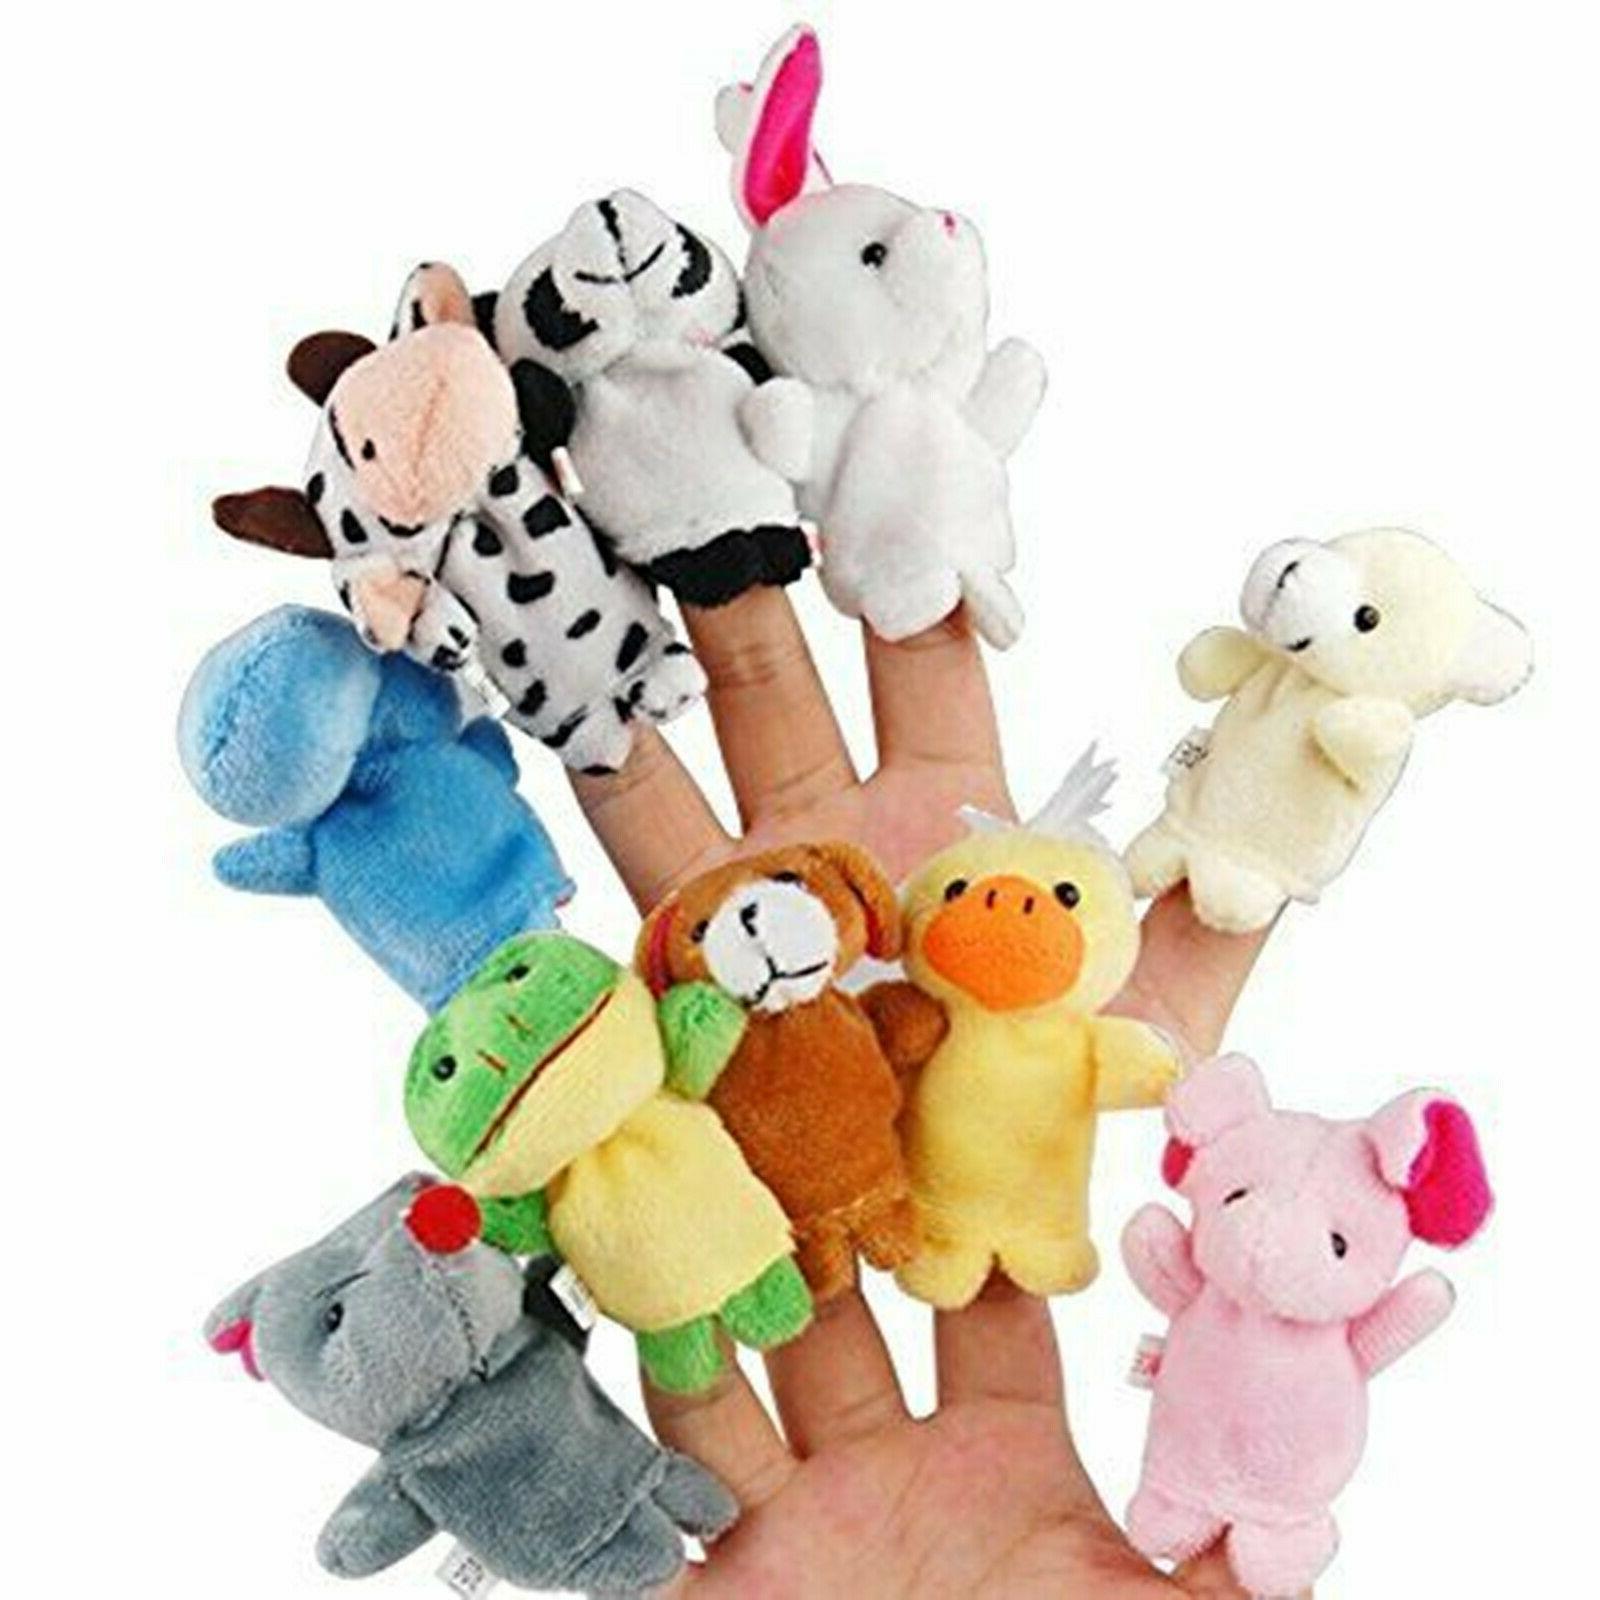 10PCS/set Cartoon Animal Finger Puppets Dolls Baby Toys